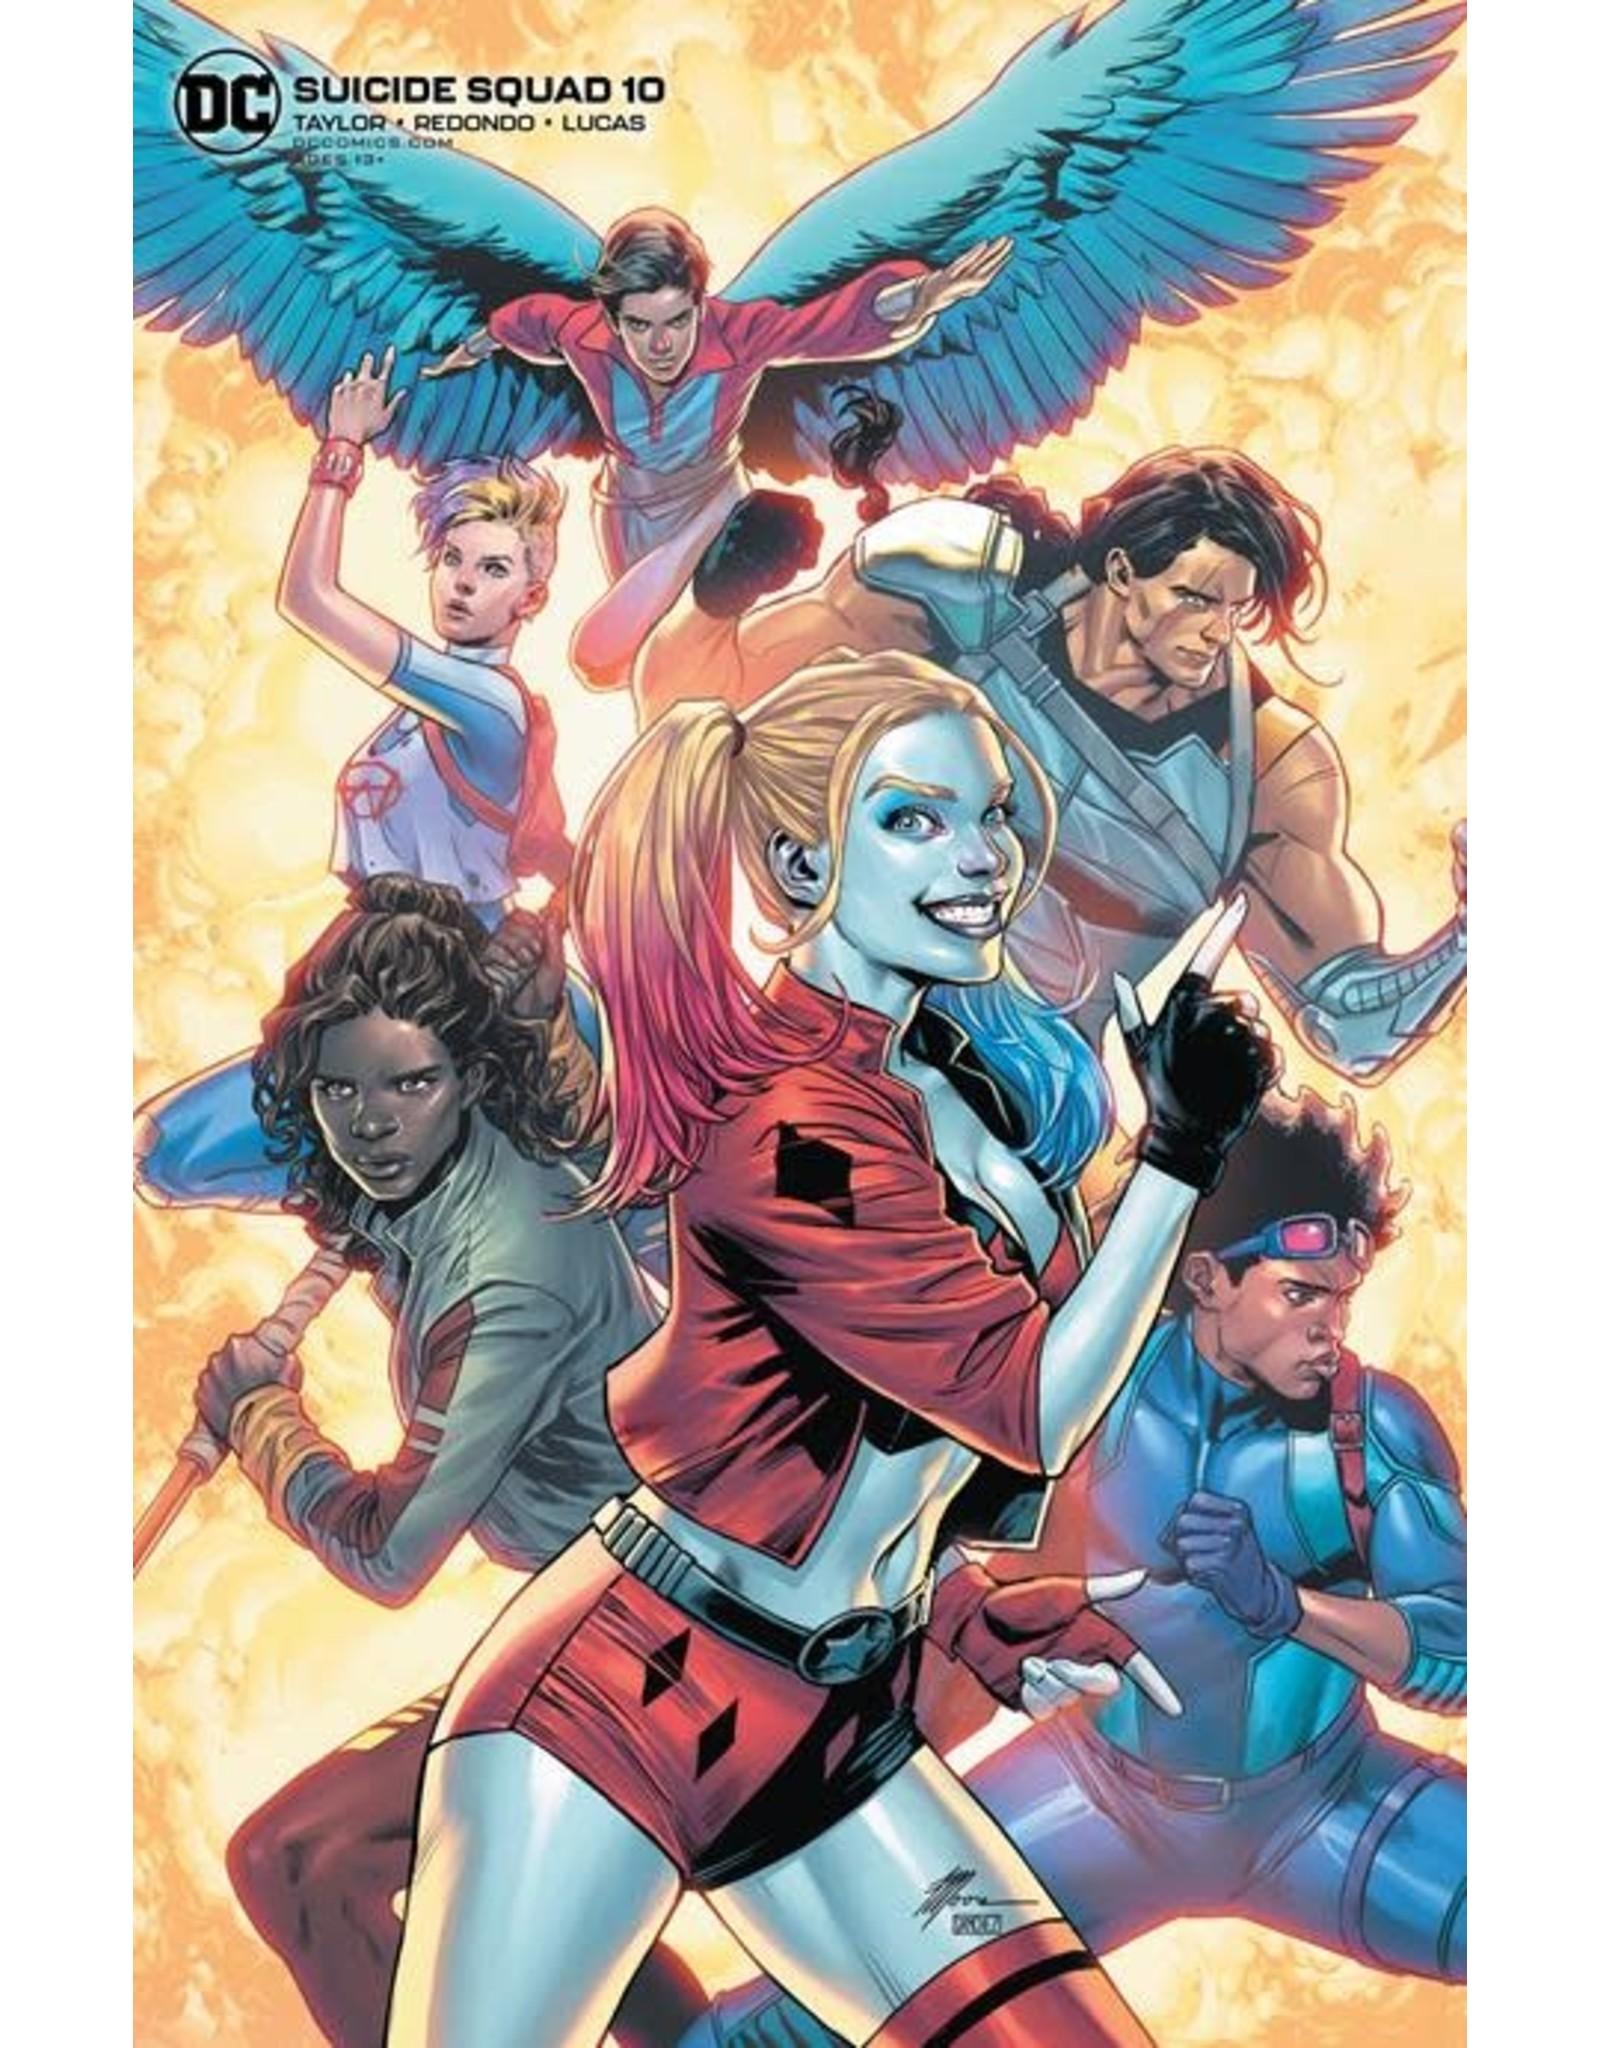 DC Comics SUICIDE SQUAD #10 CVR B TRAVIS MOORE VAR